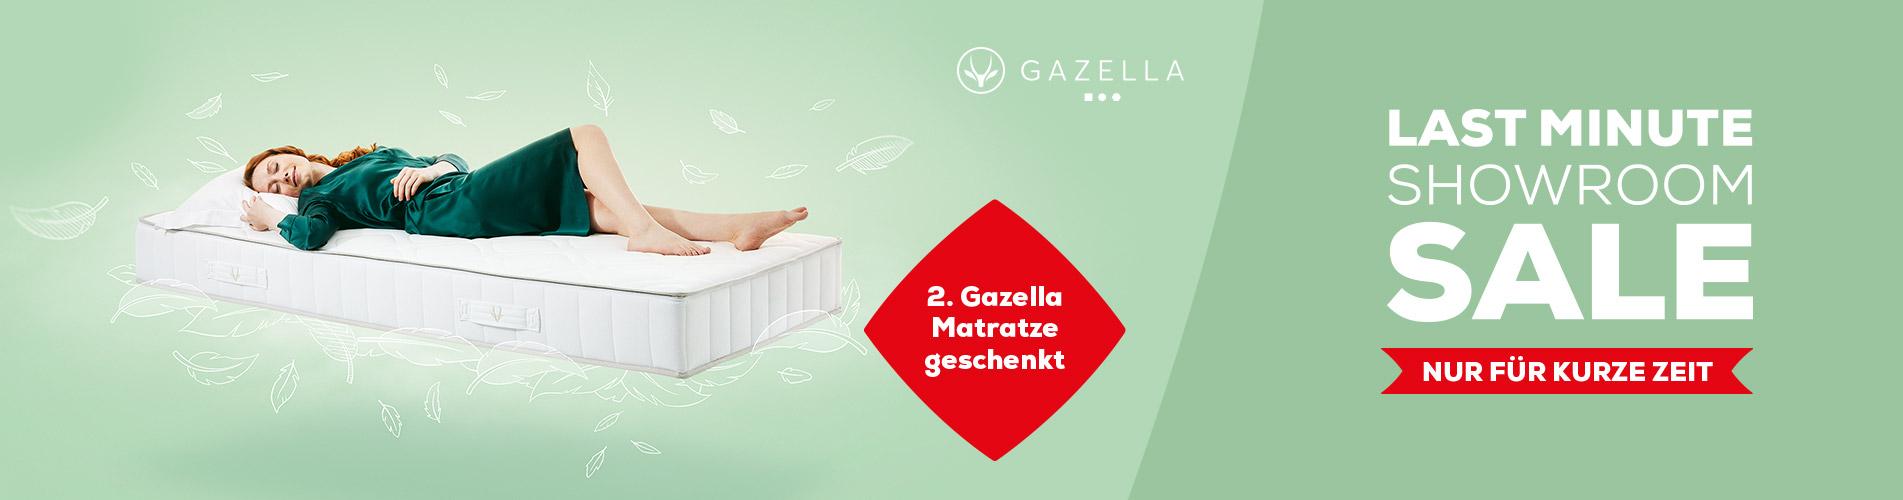 2. Gazella Matratze Geschenkt - LMSS | Swiss Sense